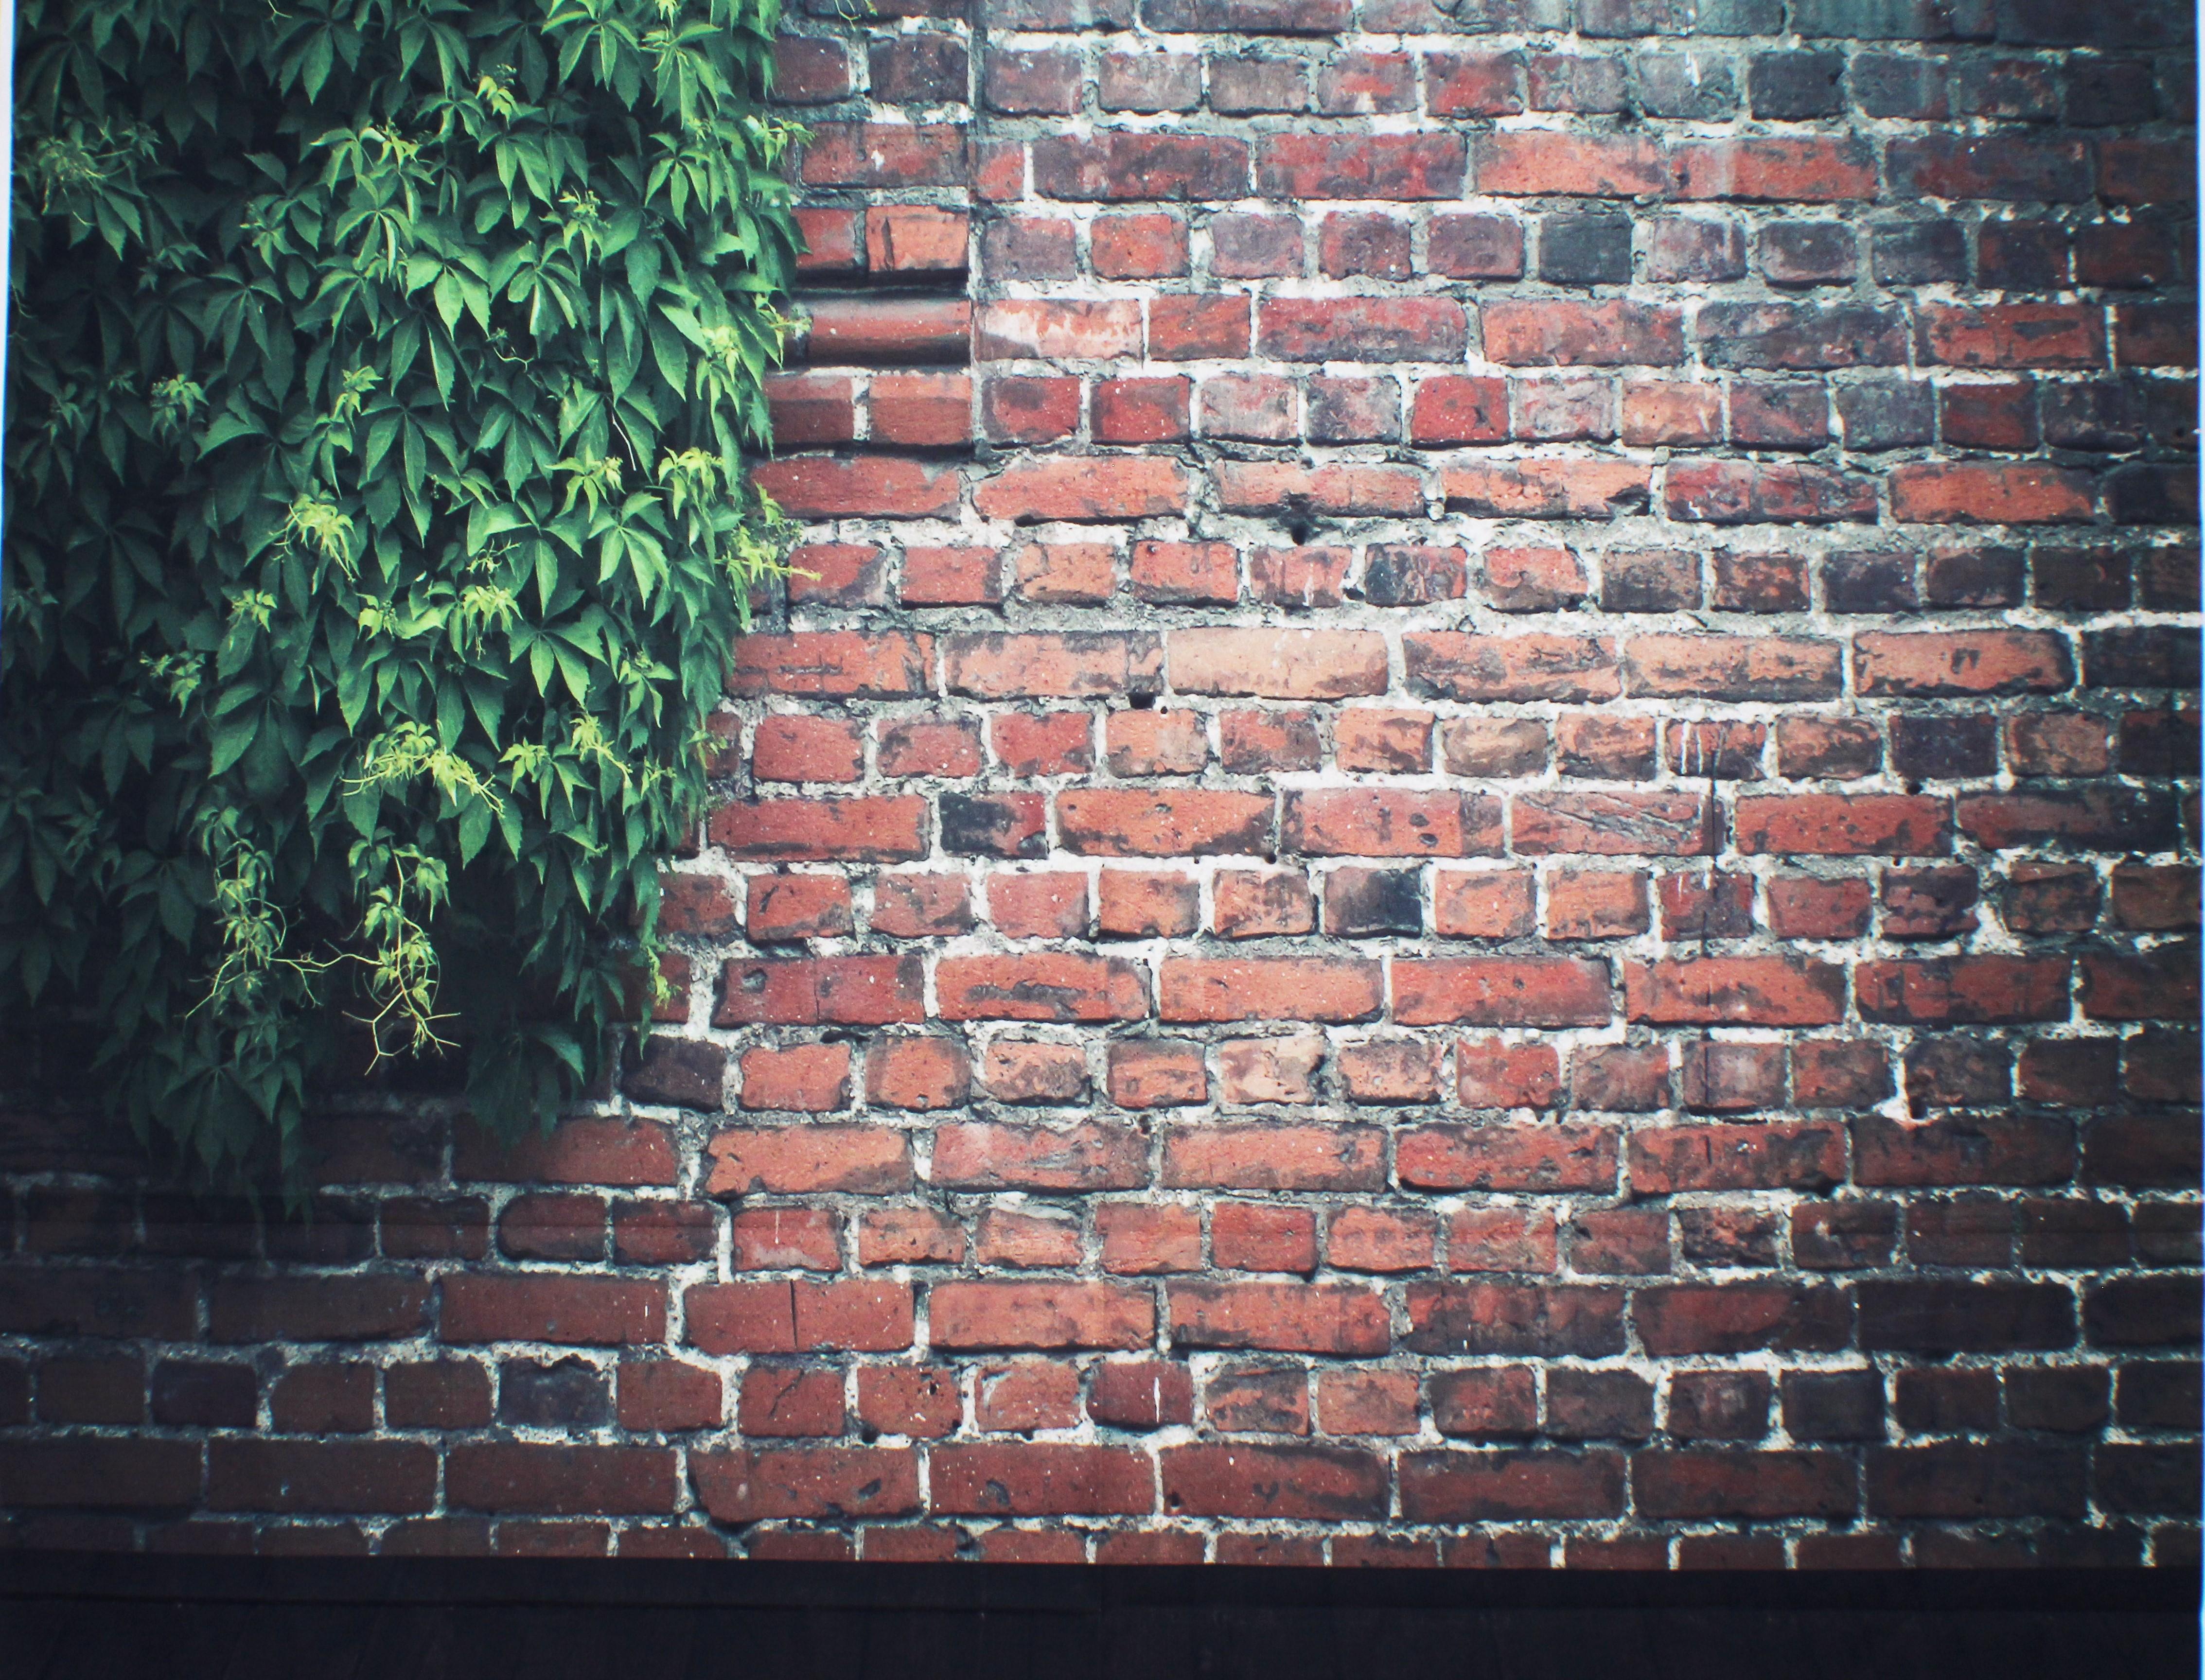 15 Brick with vine